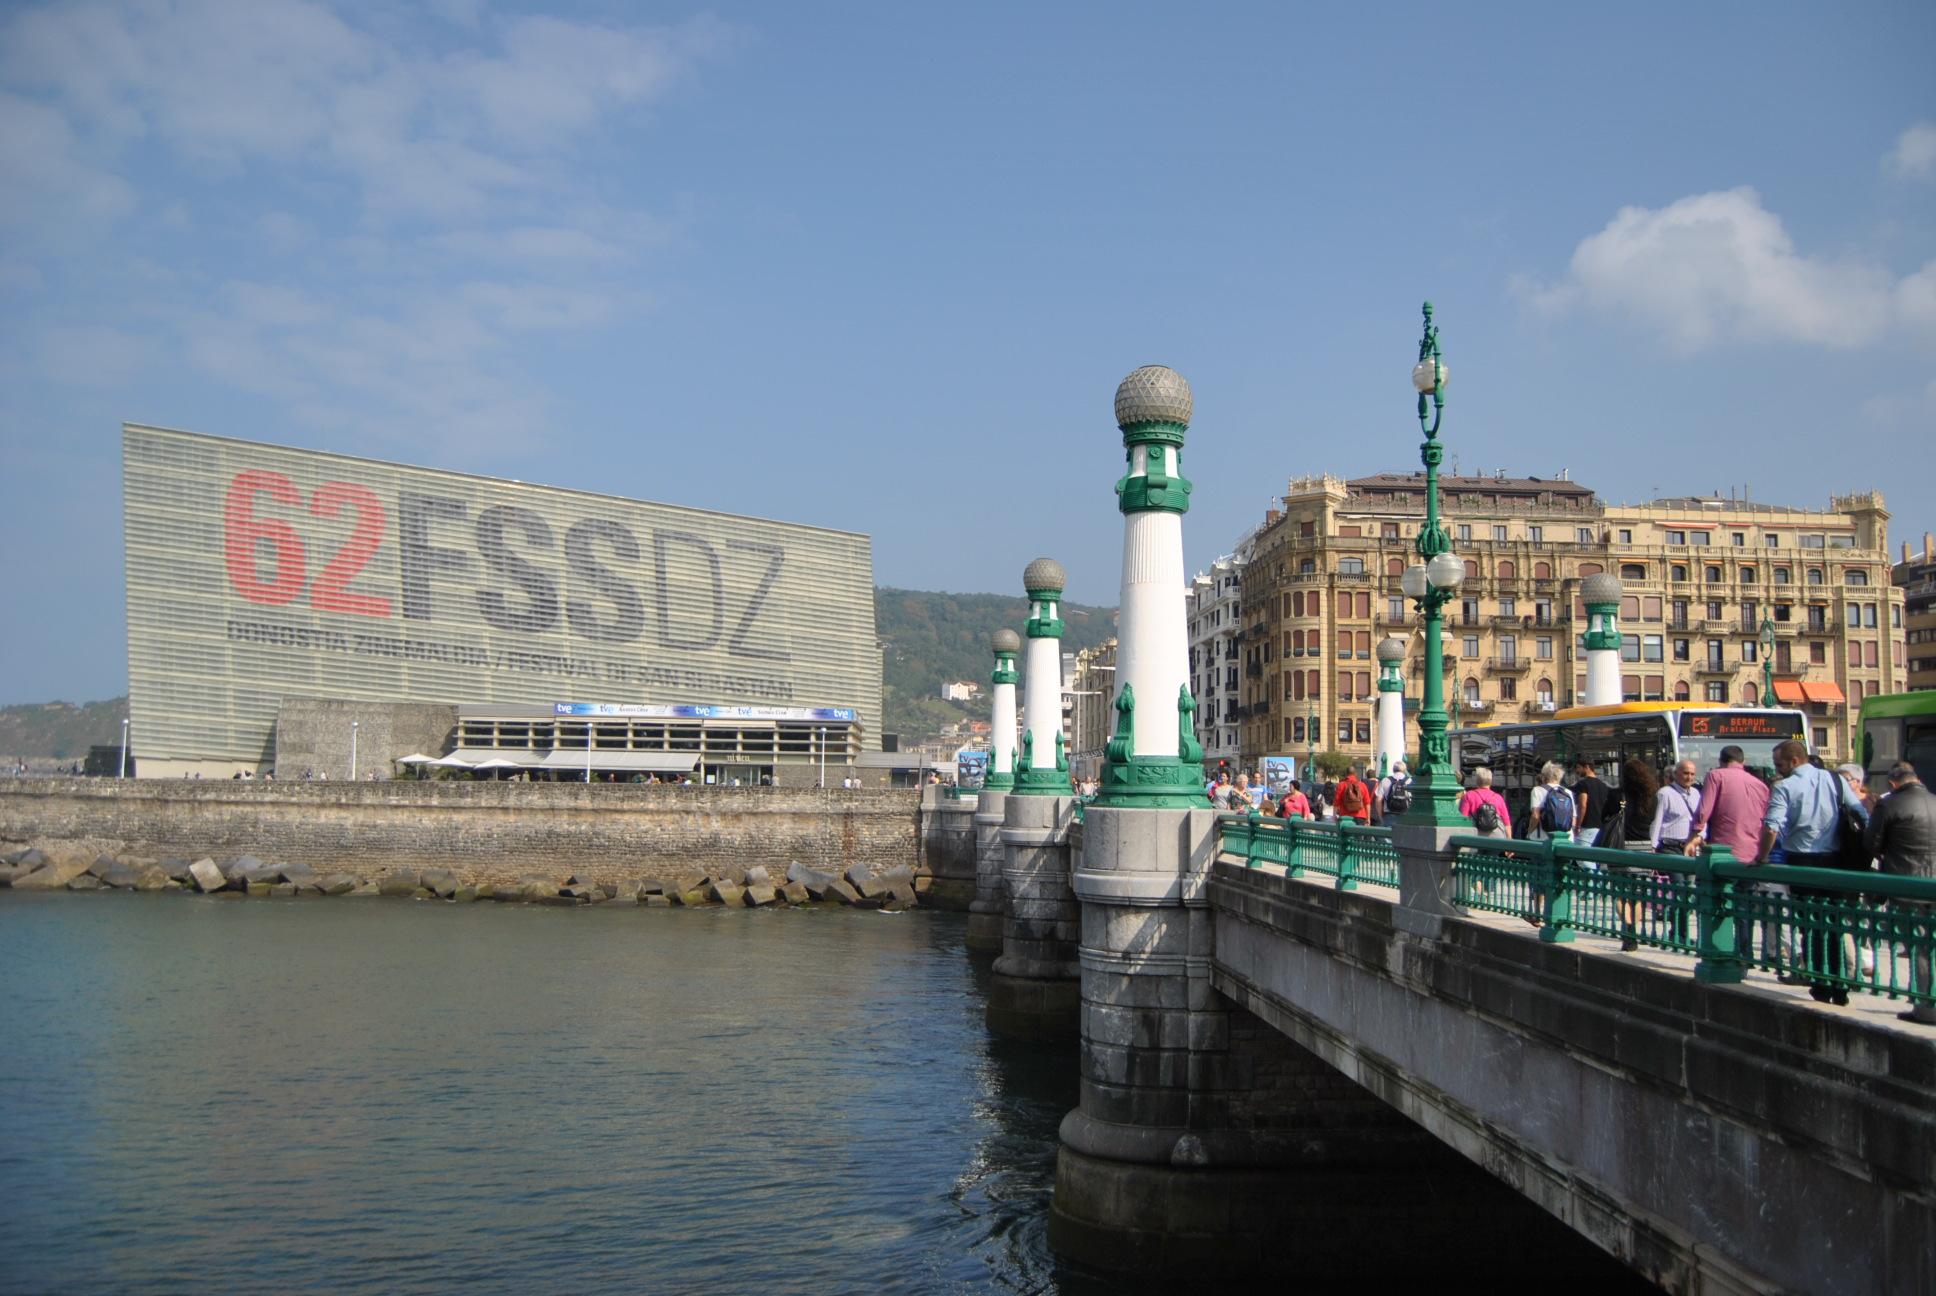 Bilbao/Donosti/San Juan de Gaztelugatxe